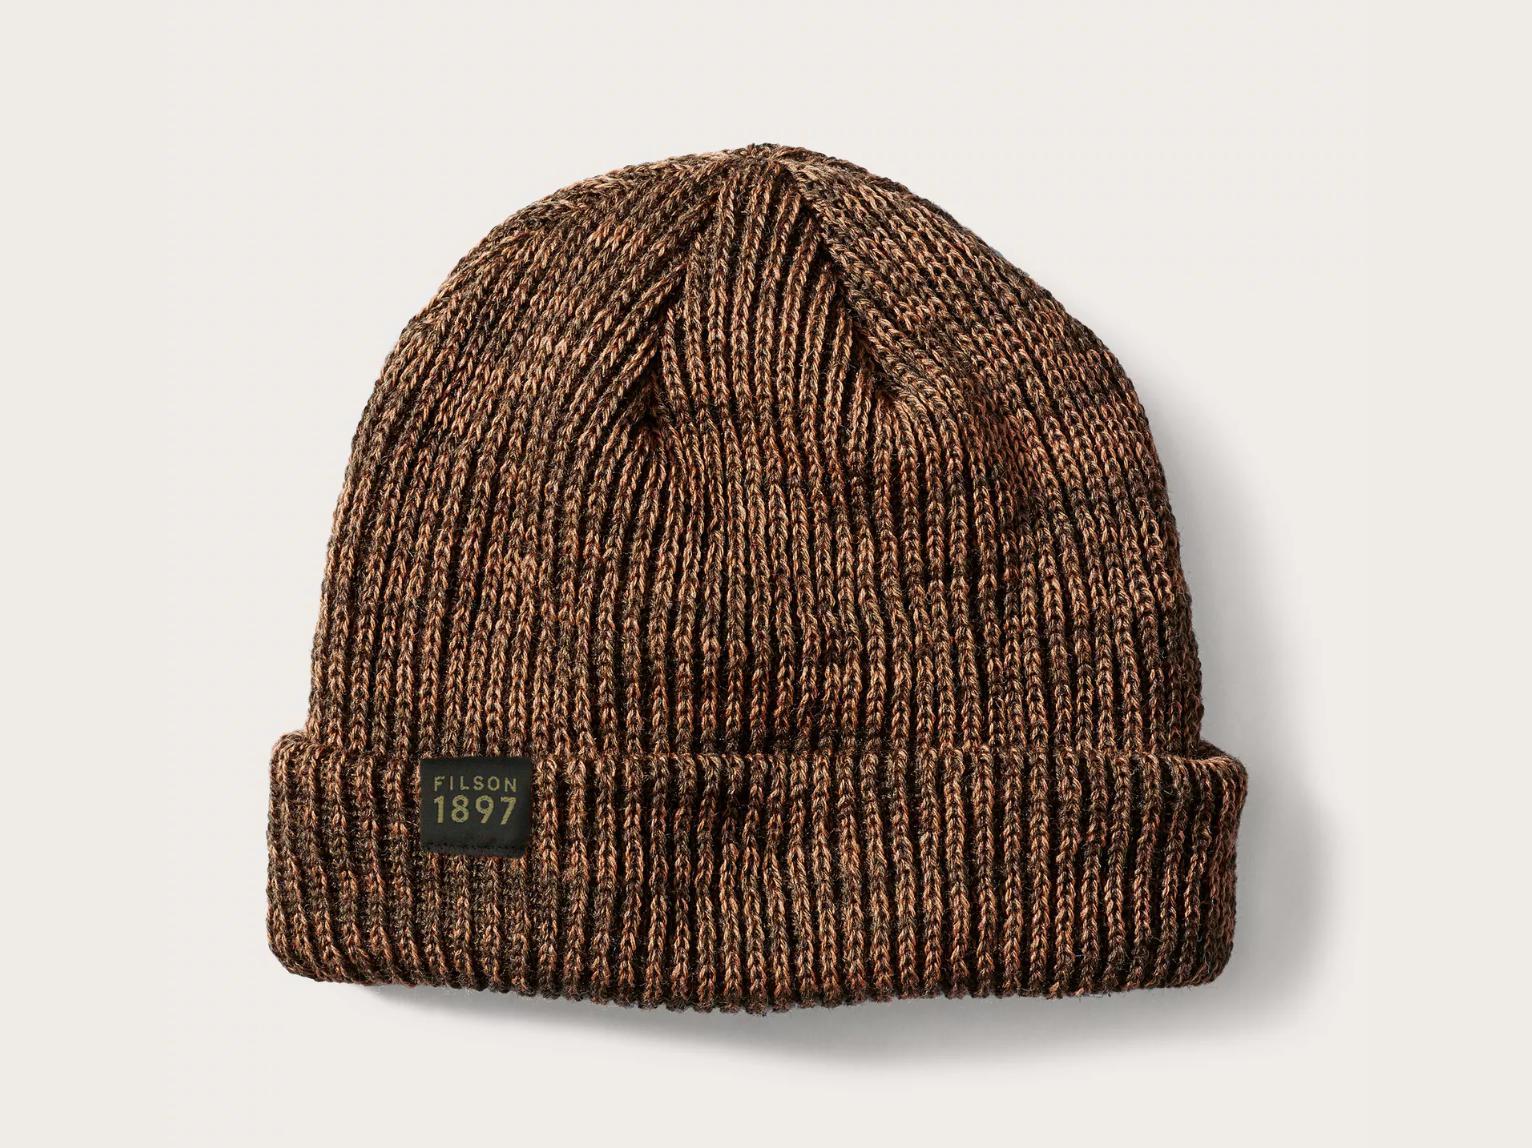 a57013993 Totem Brand Co. Filson Watch Cap Beanie in Brown - Lyst